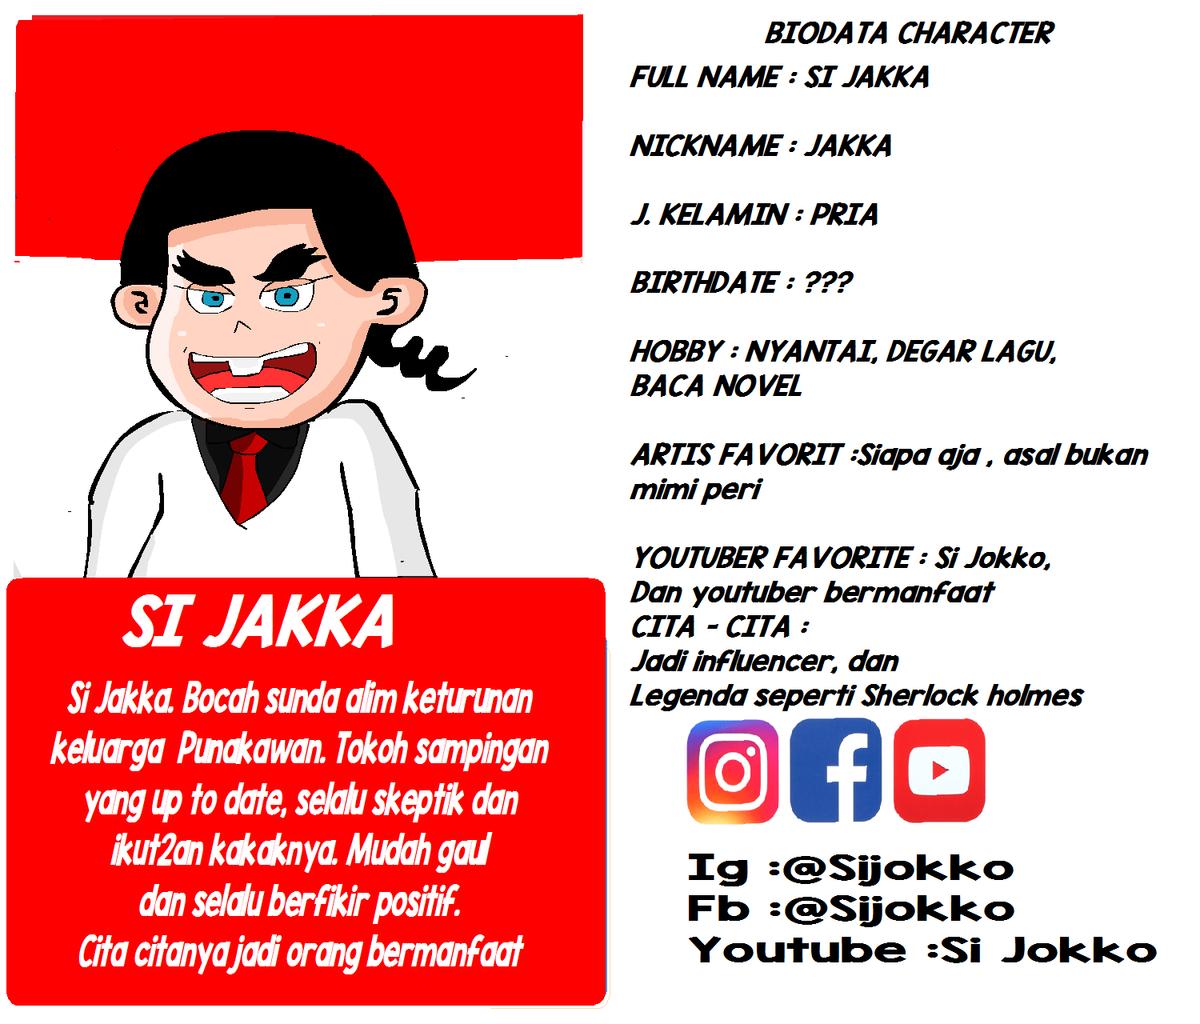 Ingat Komik Petruk & Gareng? Inilah Tokoh Komik Penerus Punakawan di Jaman now!